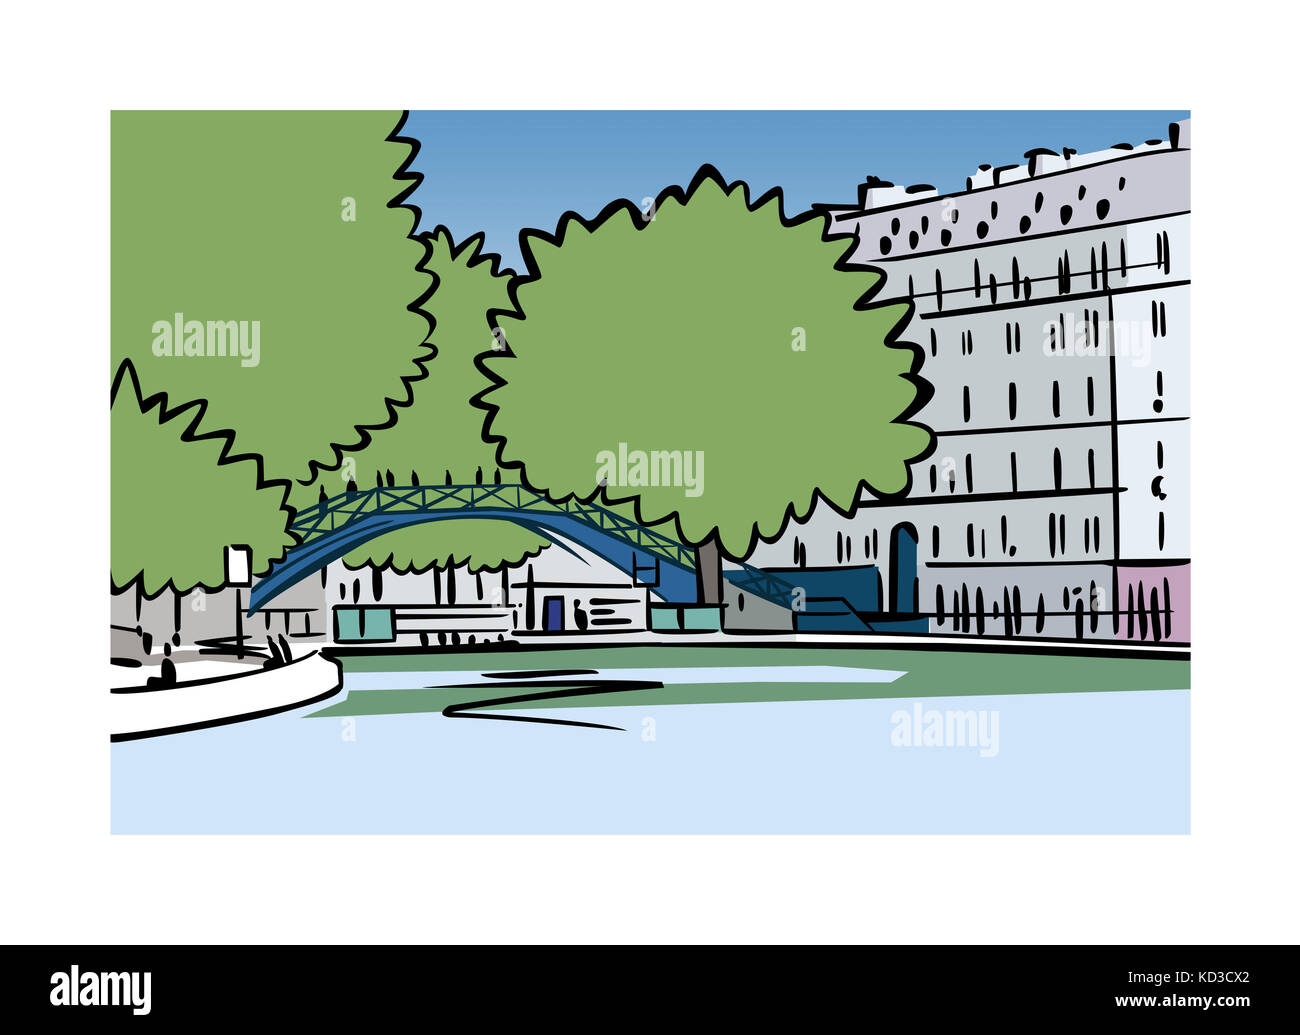 Abbildung: Canal Saint-martin in Paris, Frankreich Stockfoto